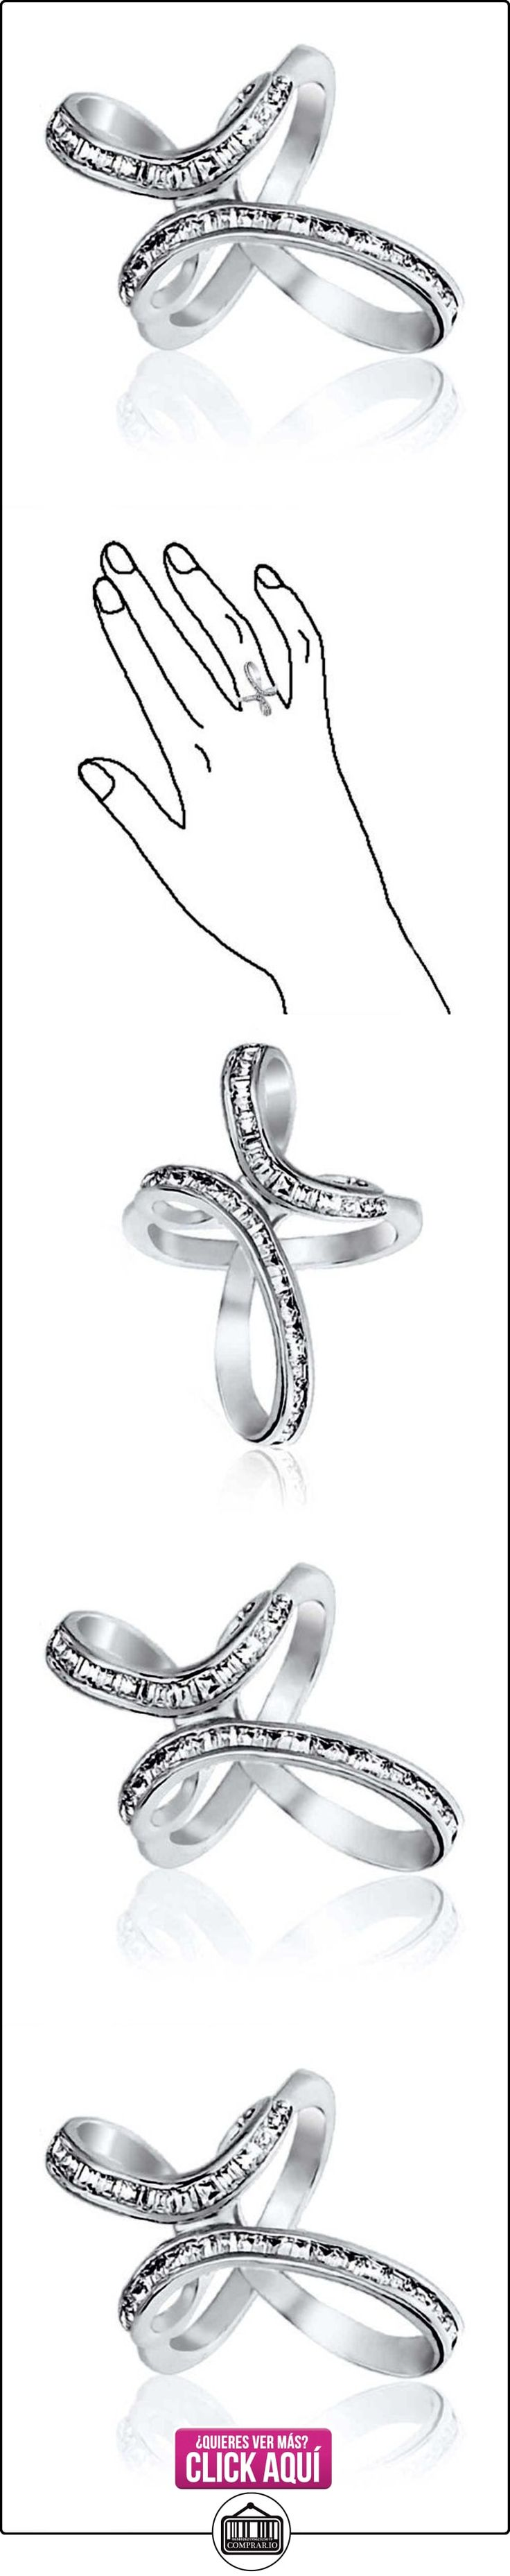 Bling Jewelry Corte Baguette CZ Plata Esterlina Anillo Infinito cruz  ✿ Joyas para mujer - Las mejores ofertas ✿ ▬► Ver oferta: https://comprar.io/goto/B01HSHYNL4